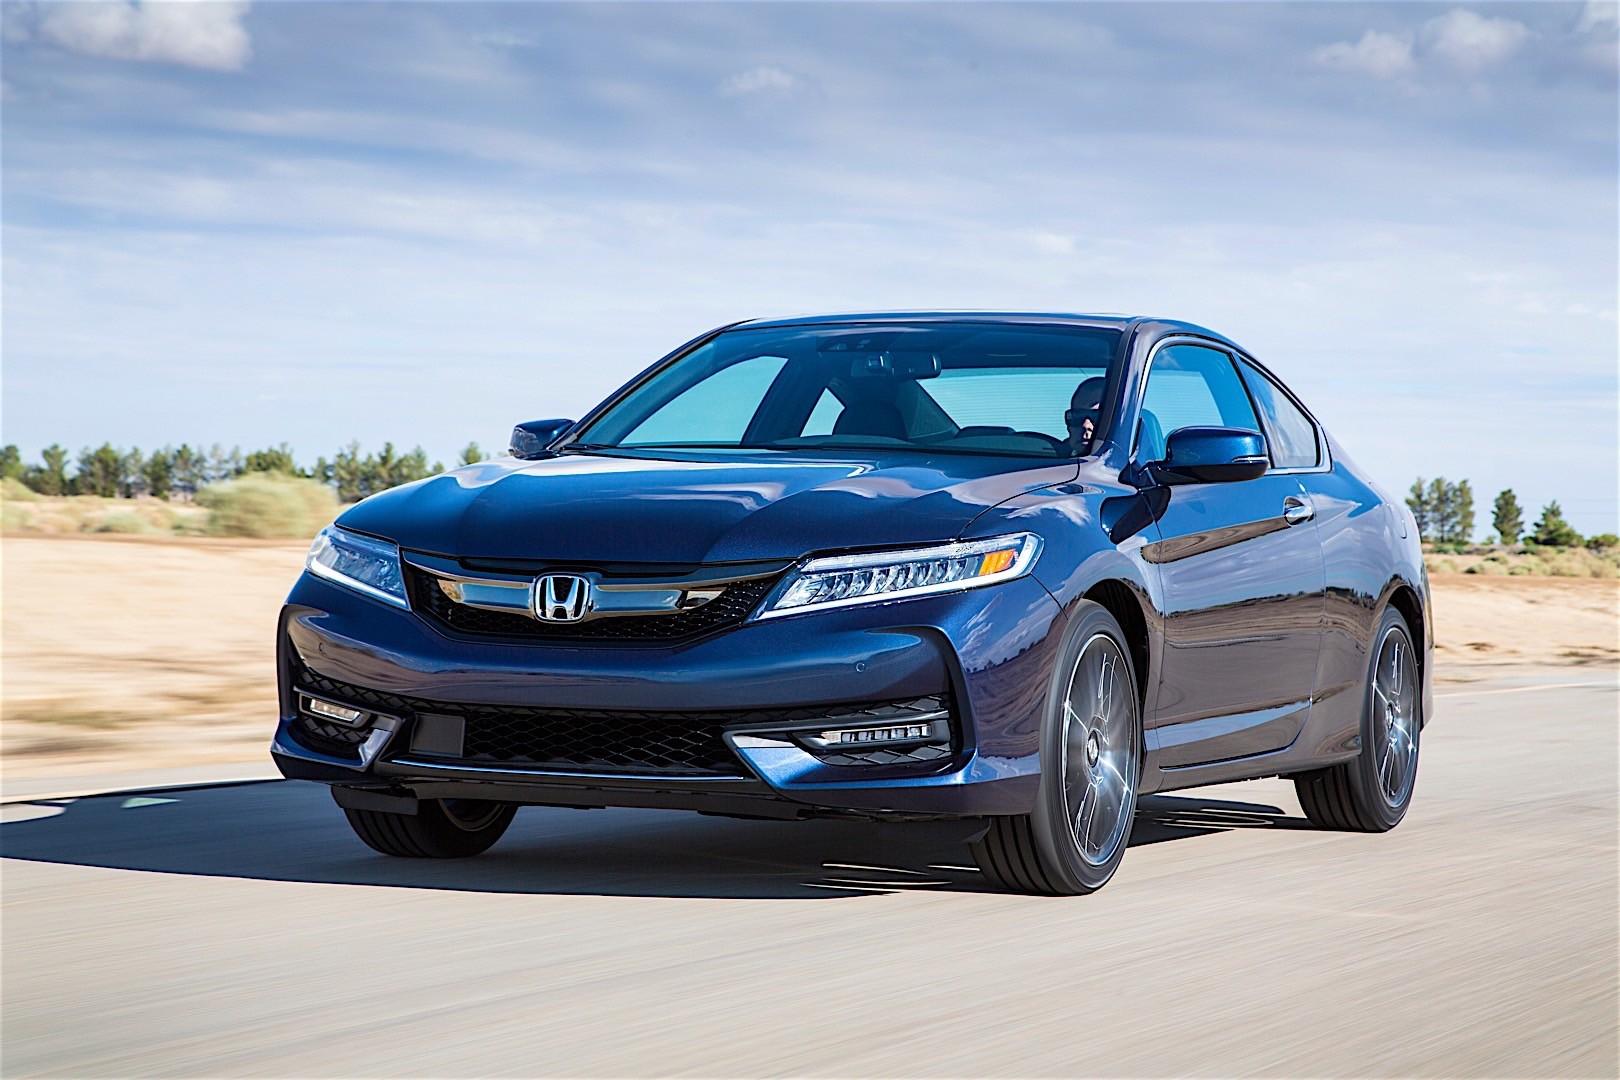 Honda crv black edition (2020): HONDA Accord Coupe specs & photos - 2015, 2016 - autoevolution